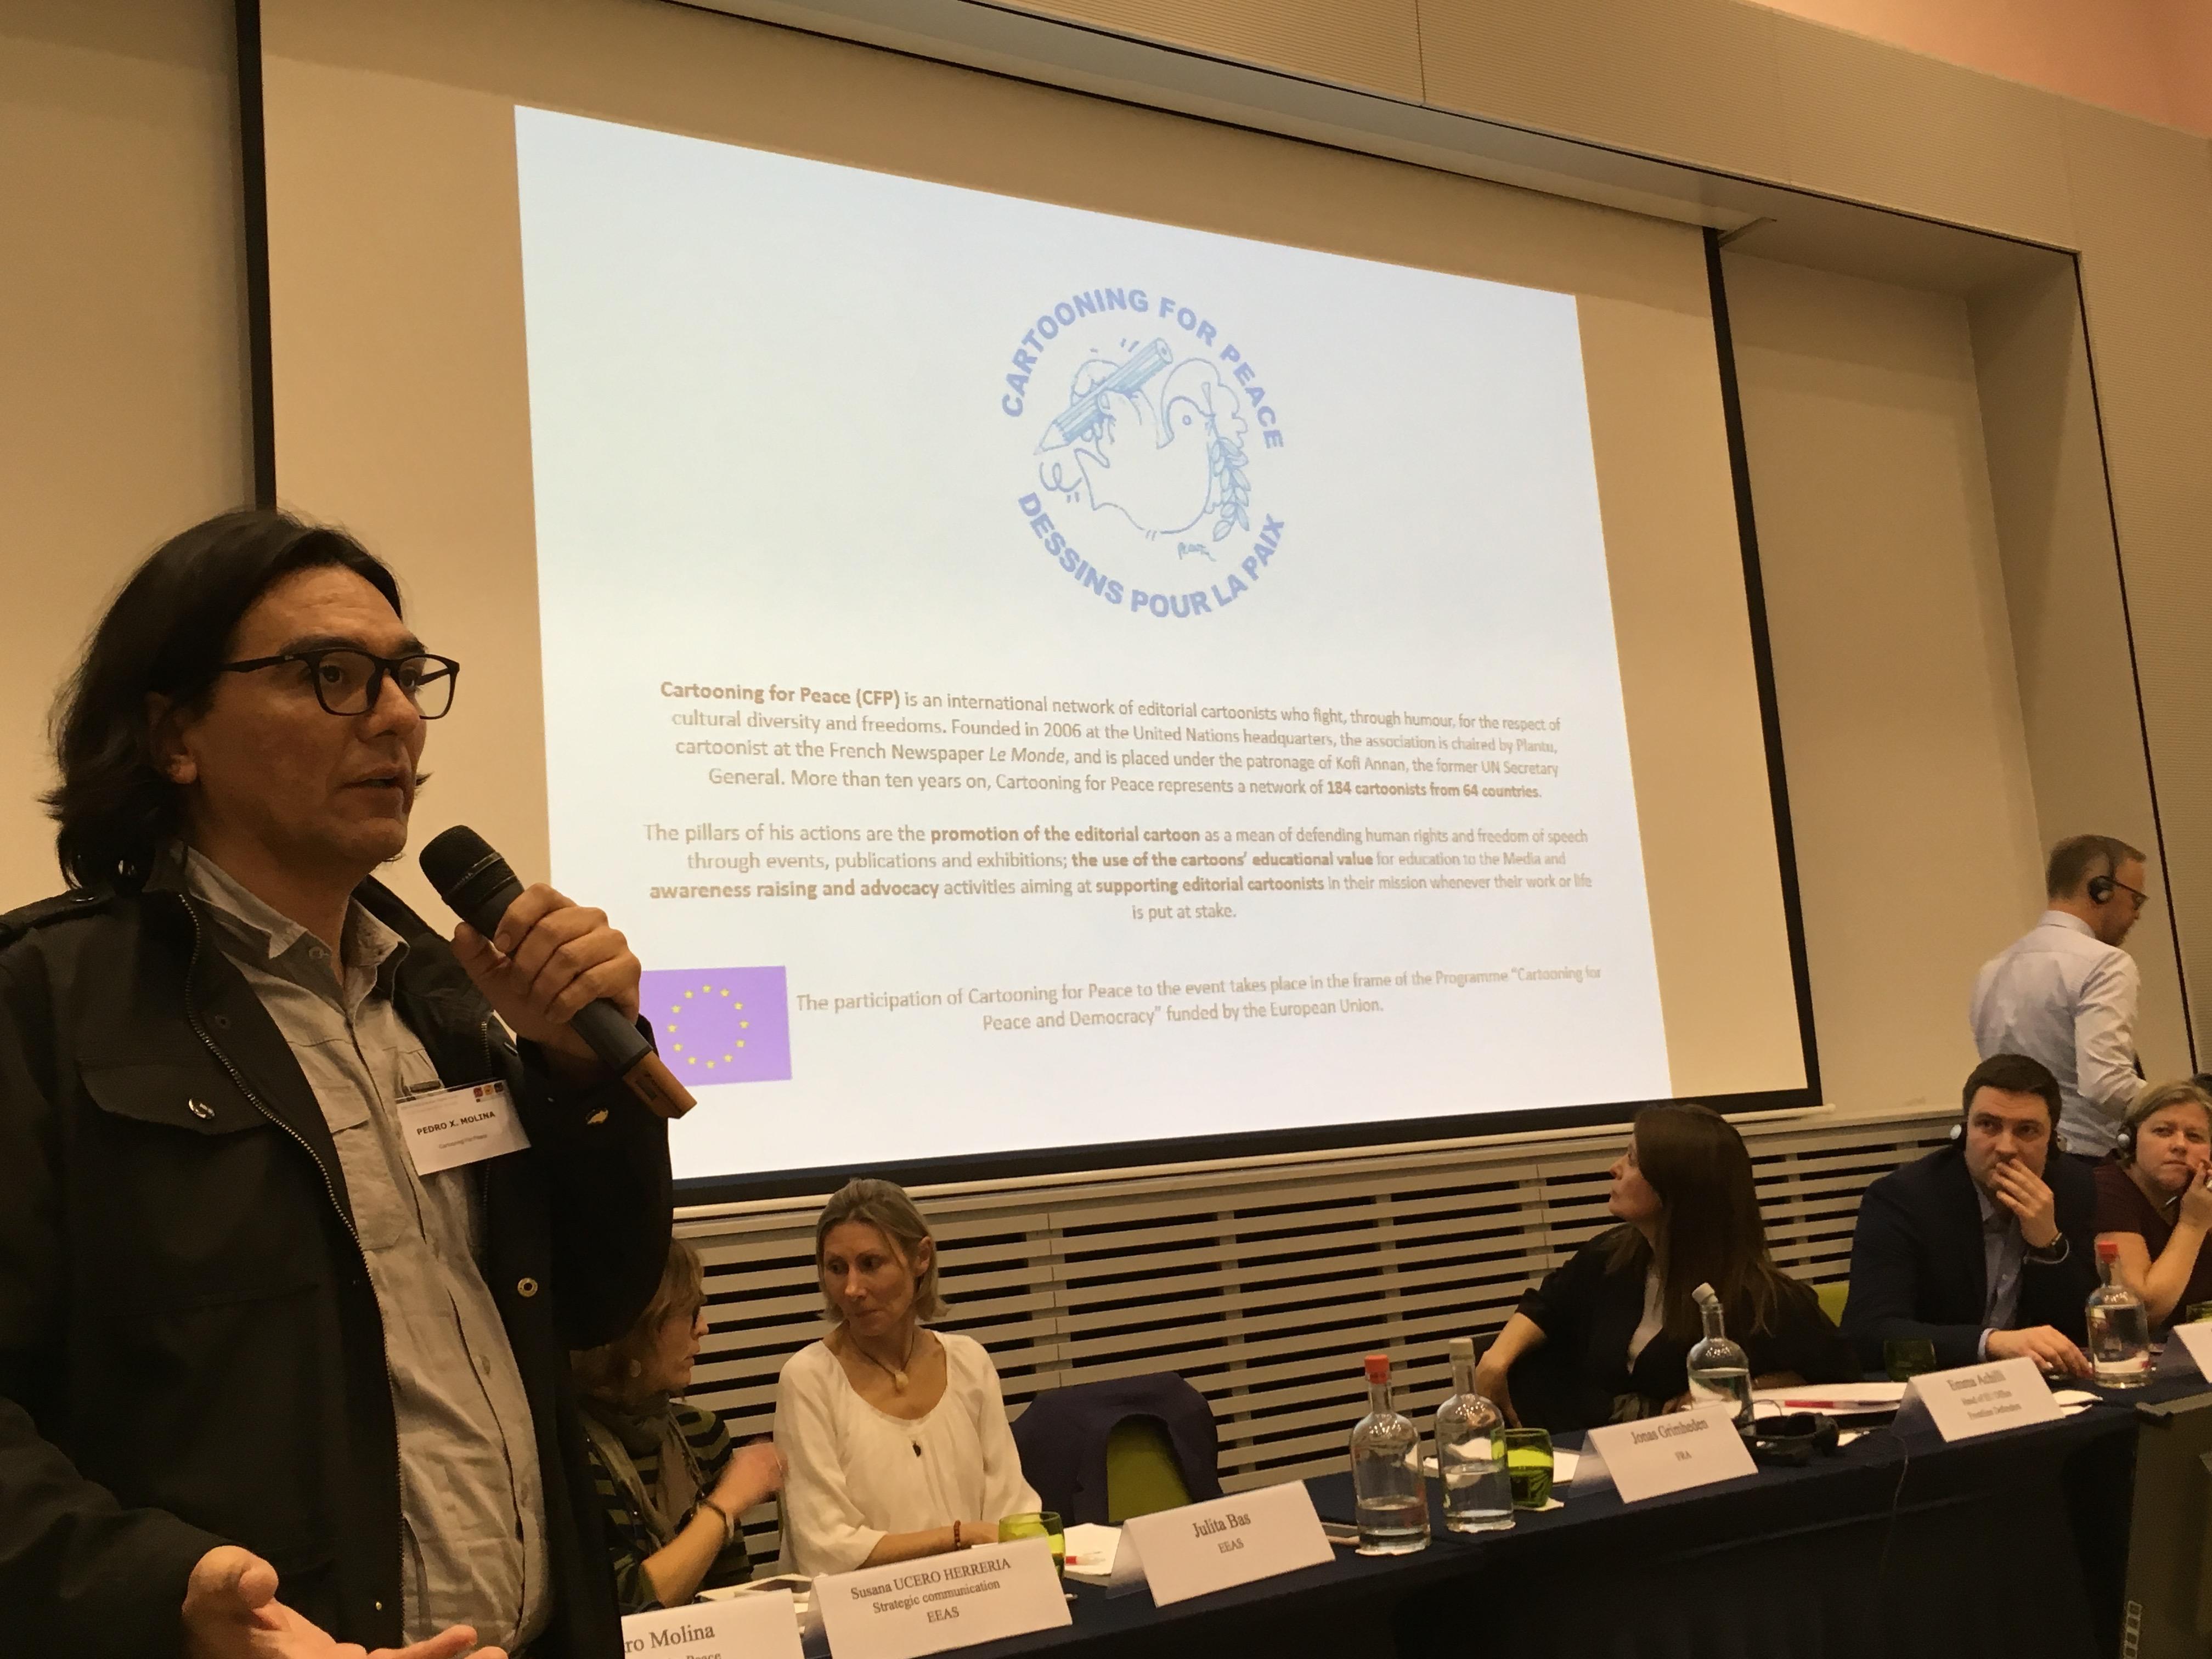 Pedro x. Molina at panel discussion at EU NGO Forum